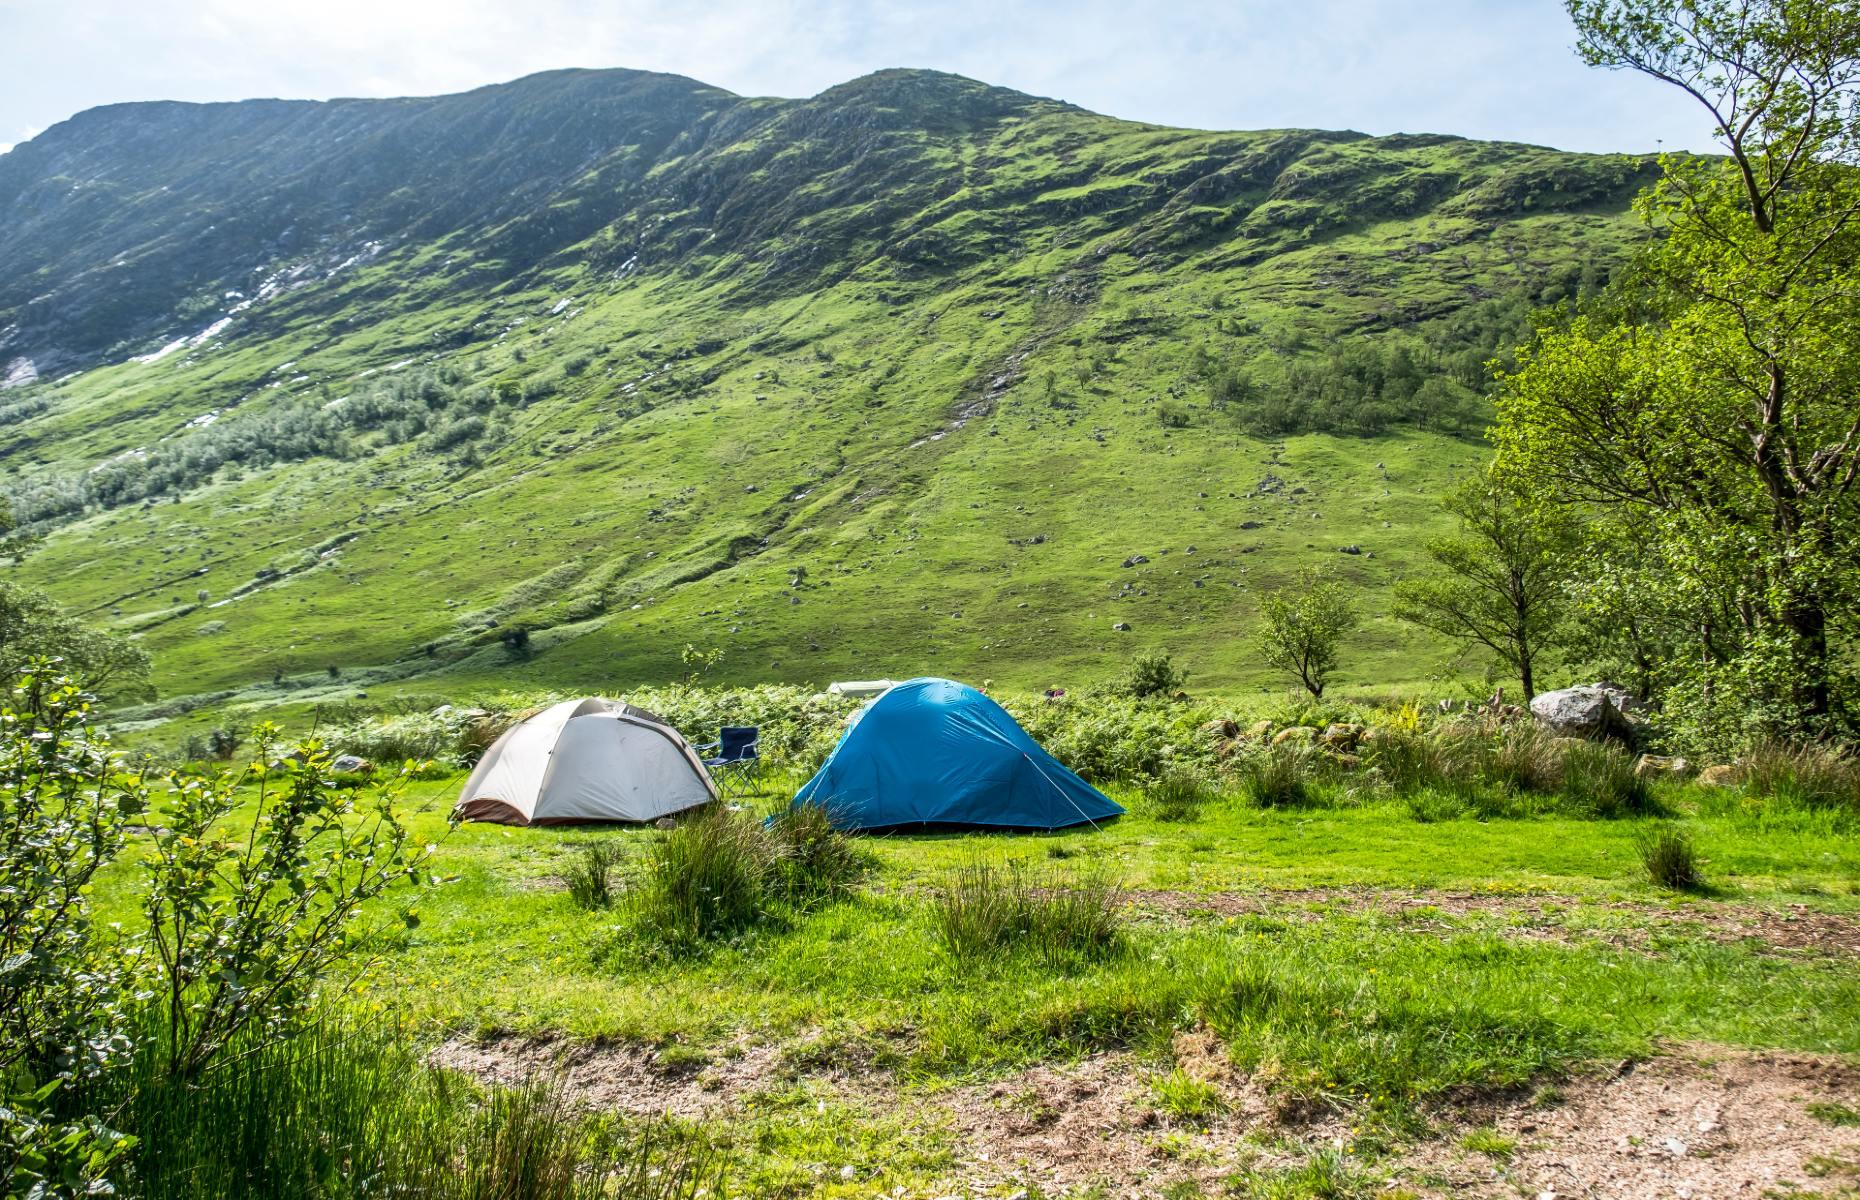 Wild camping in Scotland (Image: Lukassek/Shutterstock)